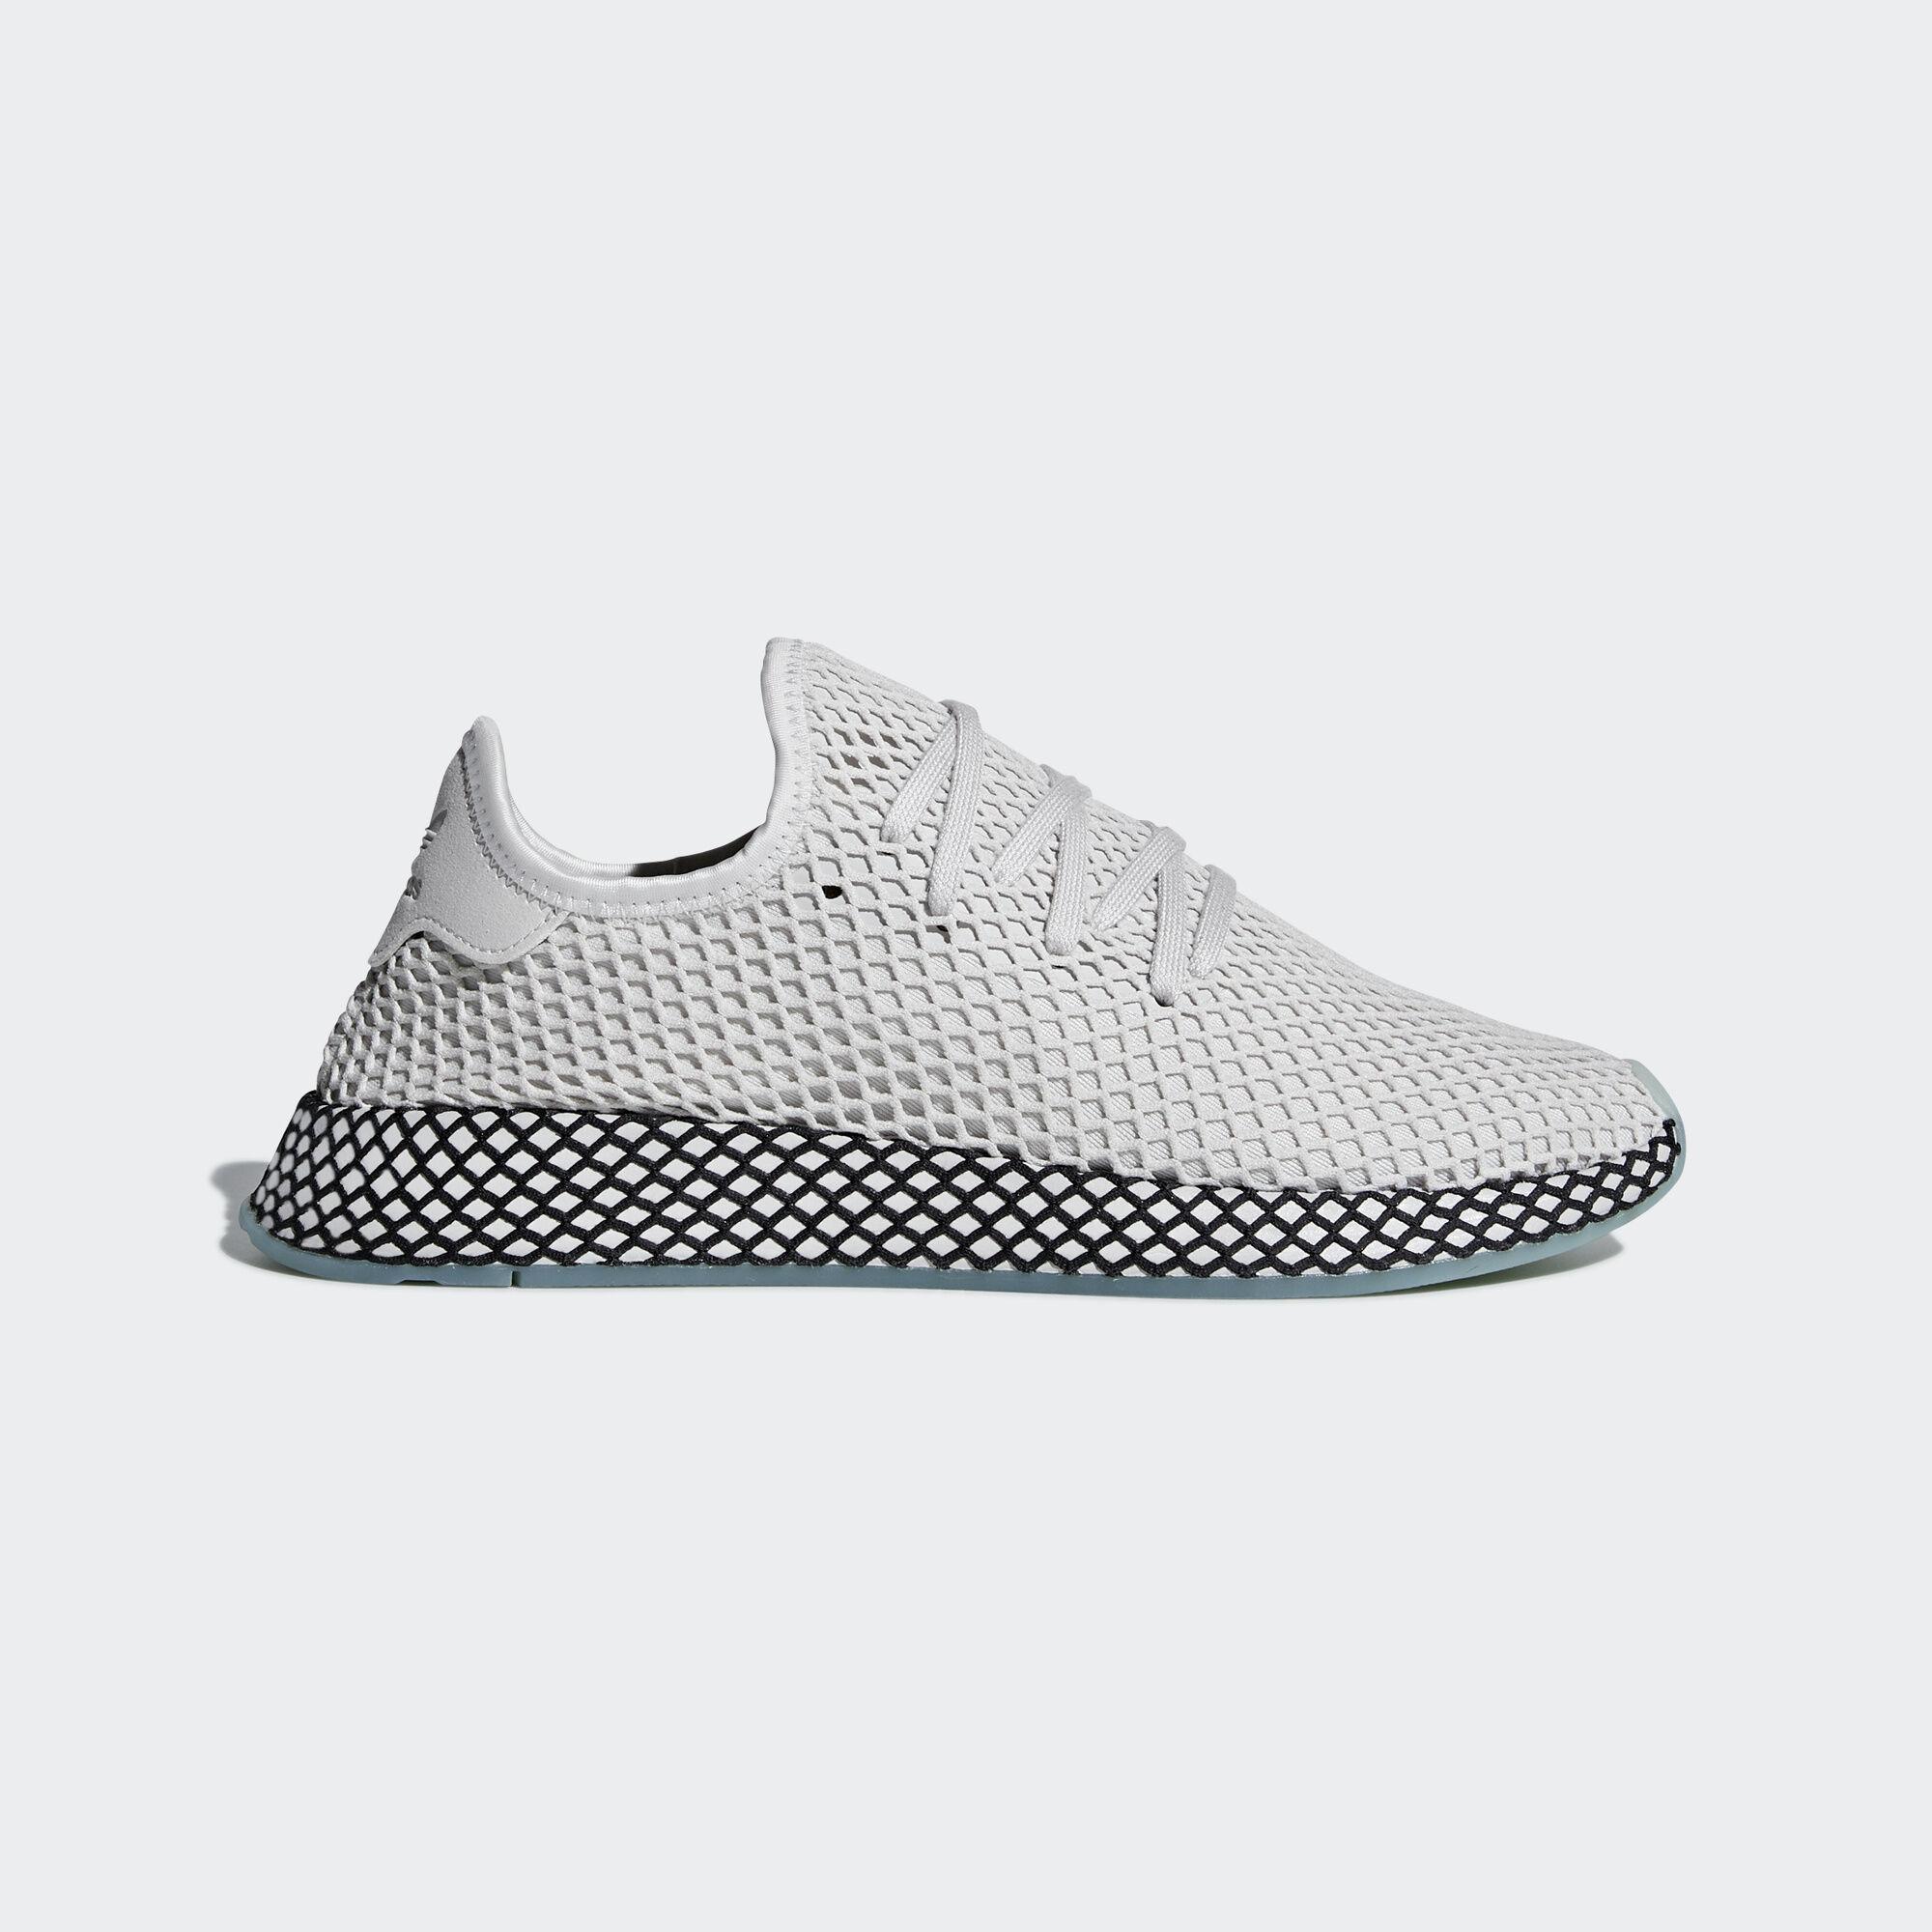 newest 0a5de eaf8f adidas - Deerupt Runner Shoes Grey One  Grey One  Clear Mint B41754.  Originals